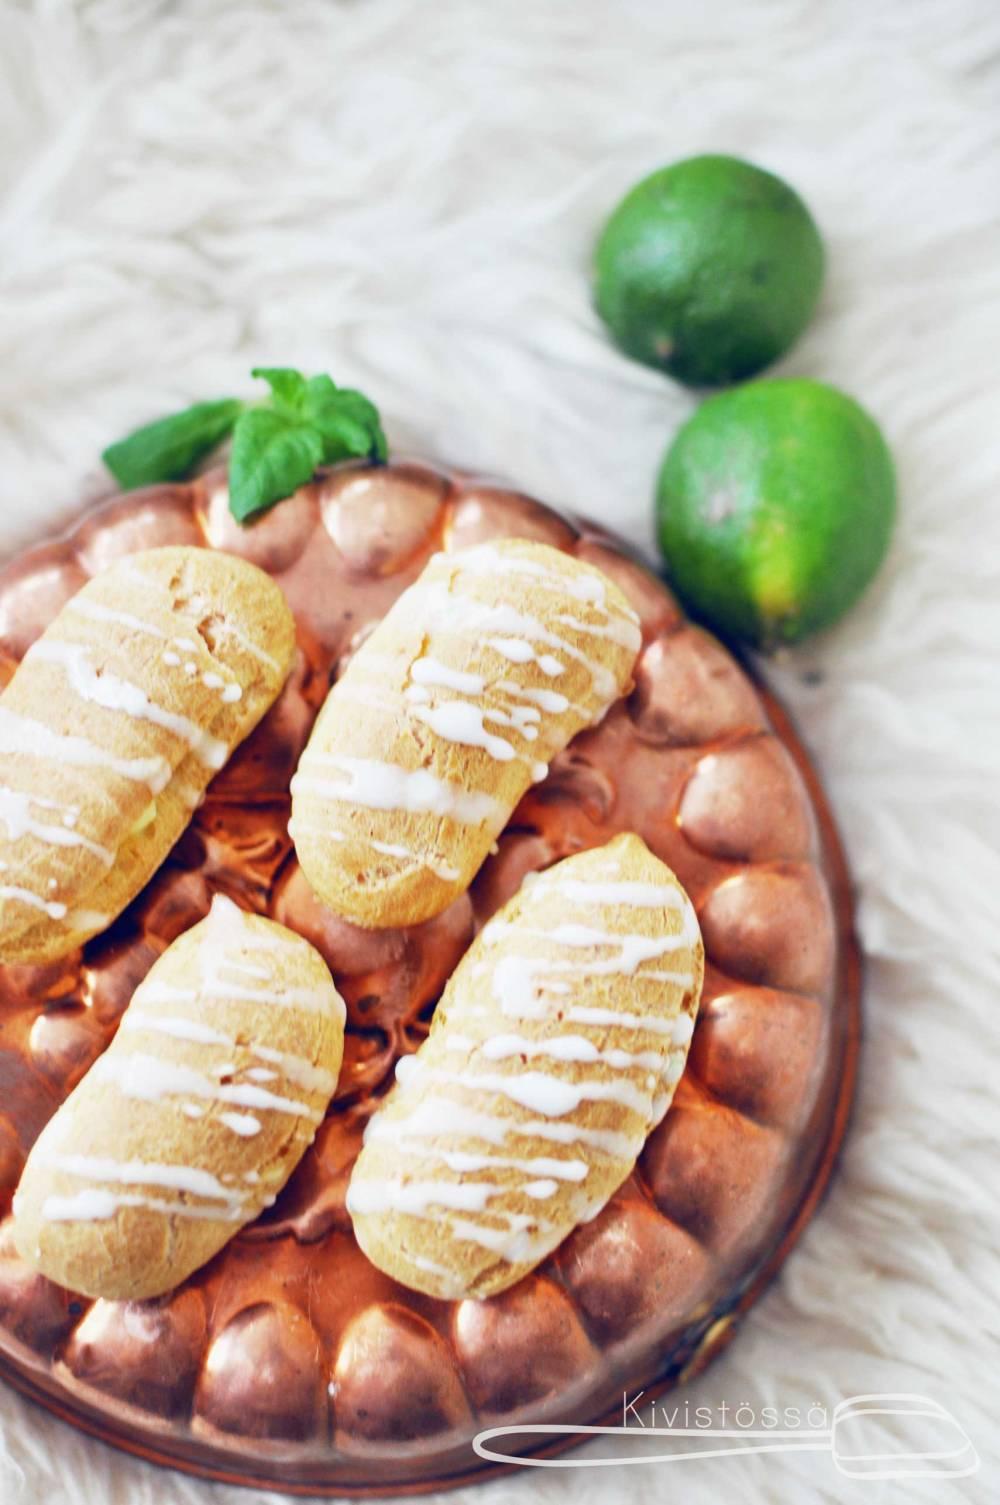 Lime and mint éclairs - Kivistössä Foodblog www.kivistossa.com